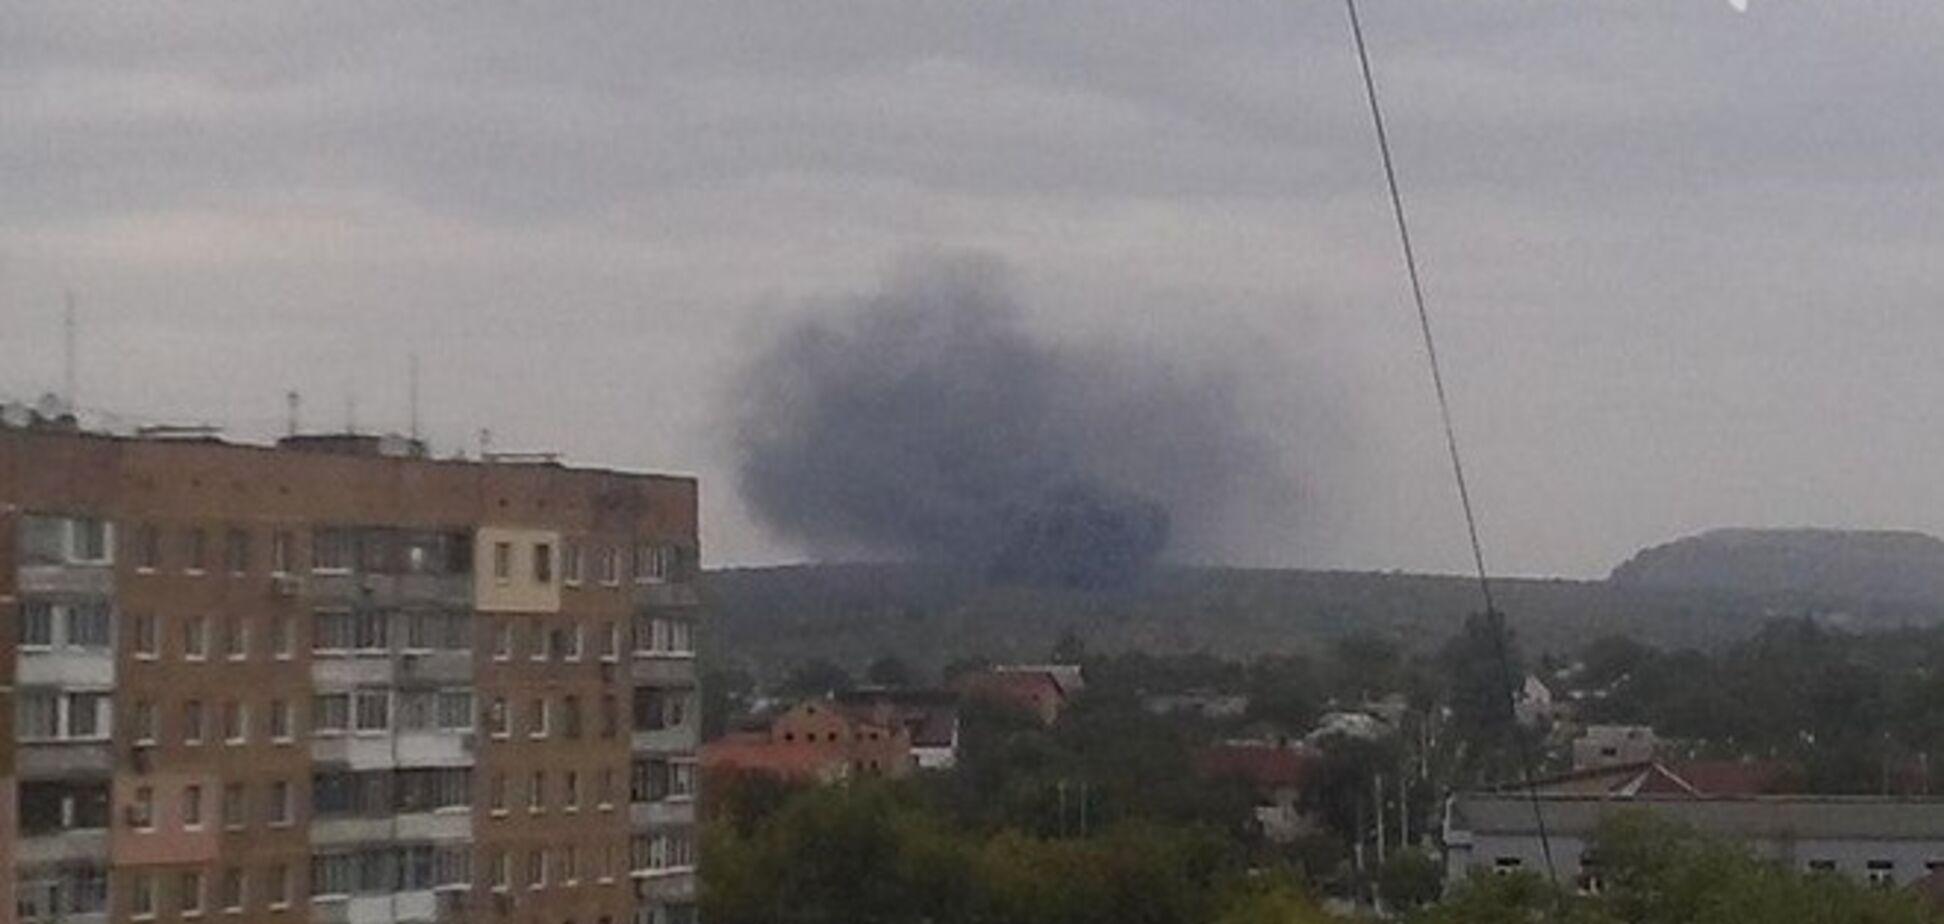 Над Донецком снова видны клубы дыма: опубликованы фото